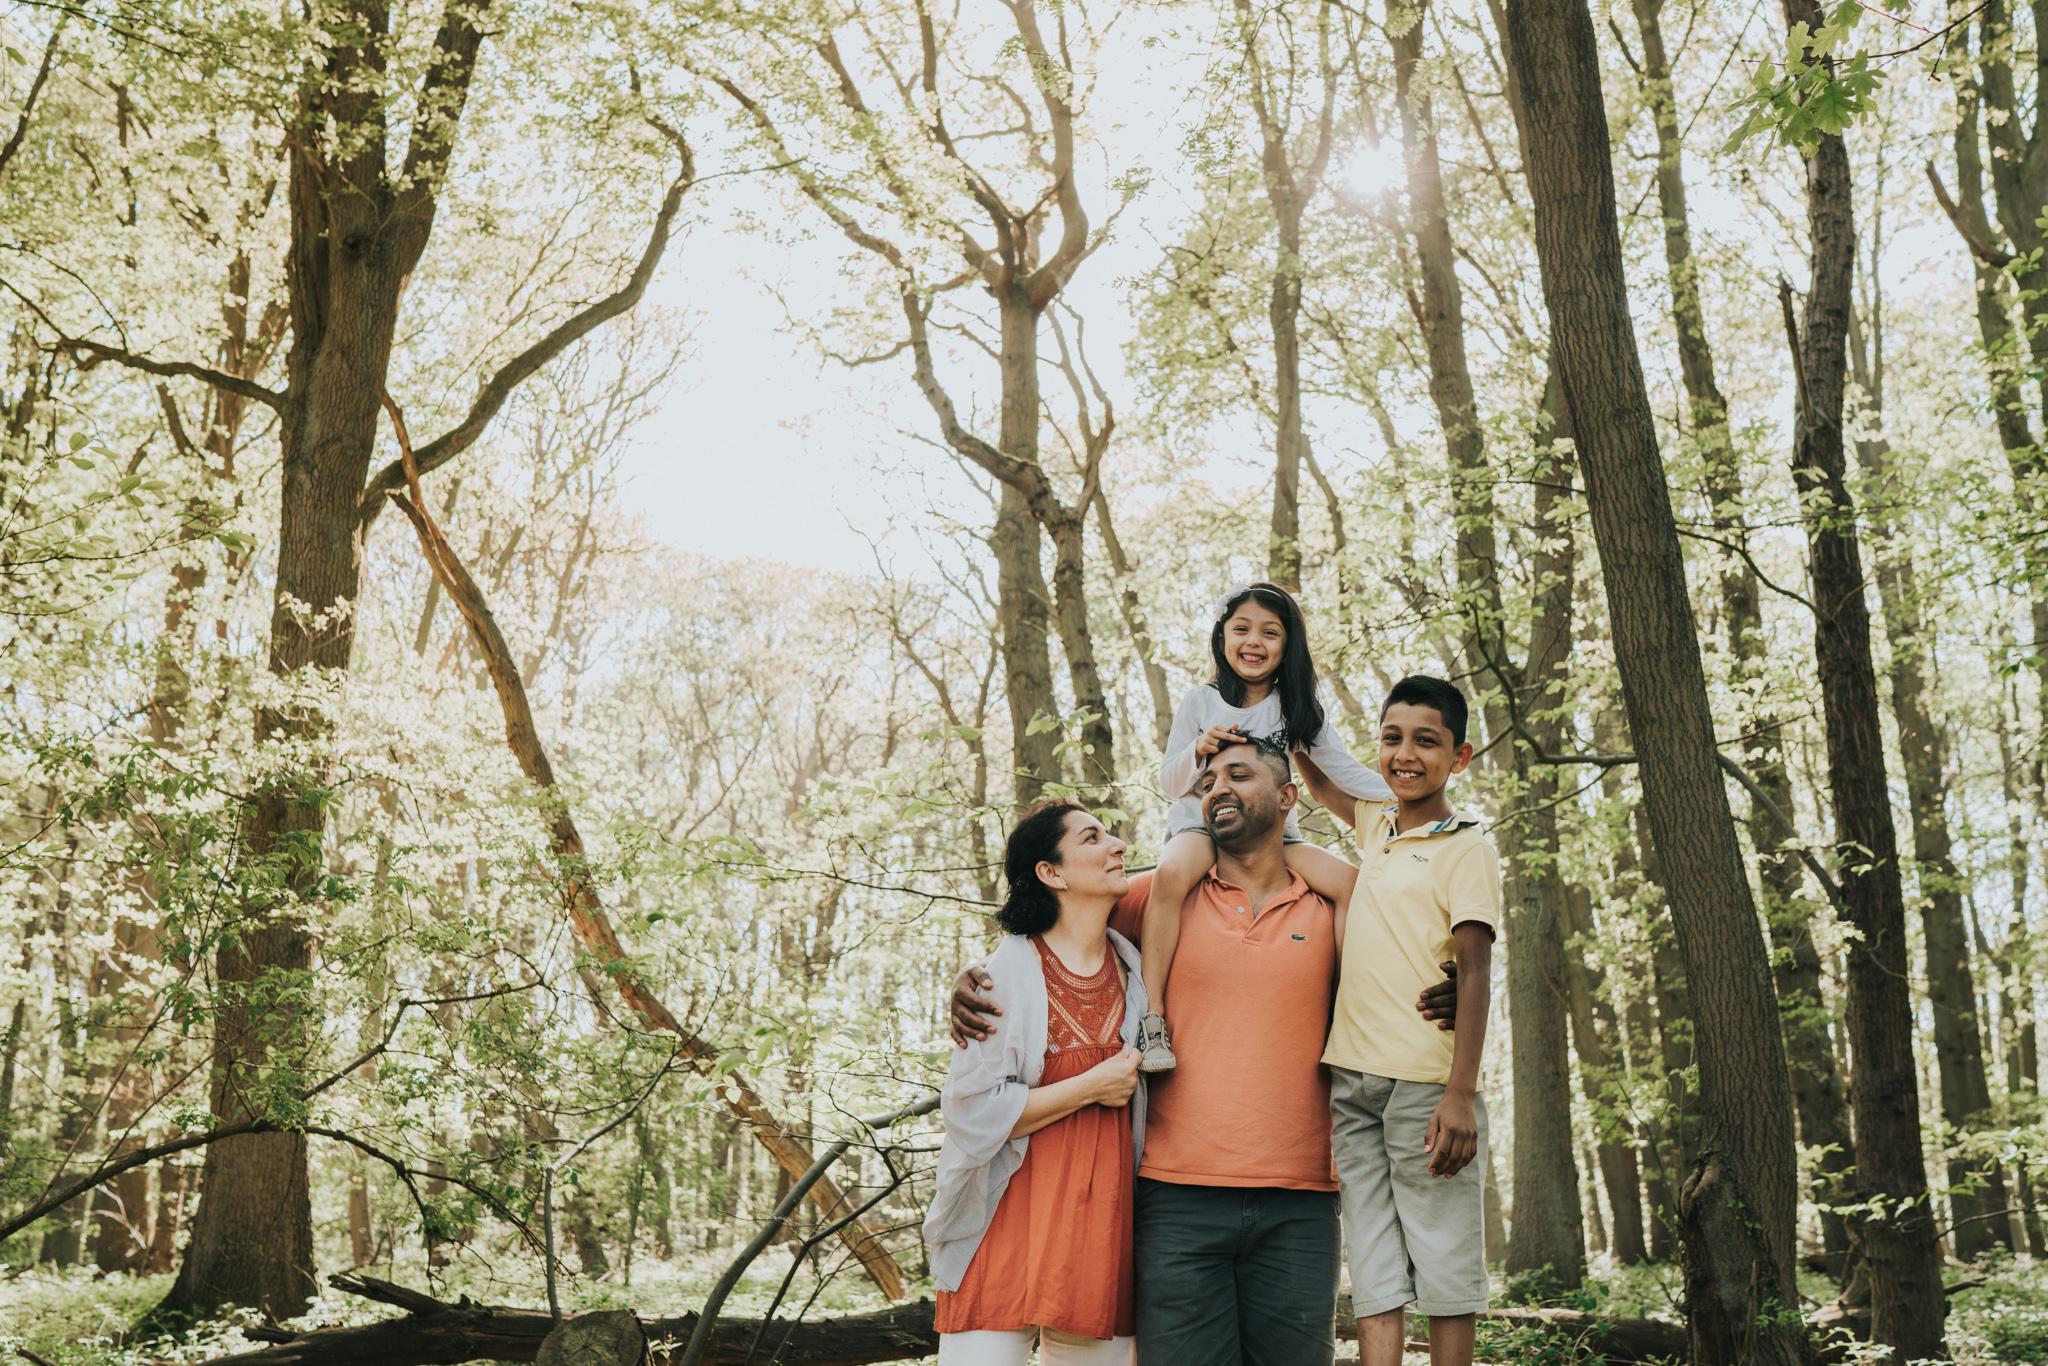 Chandrasiri-Family-Session-Woodland-Colchester-Essex-Grace-Elizabeth-Alternative-Wedding-Photographer (1 of 1).jpg (26 of 34).jpg